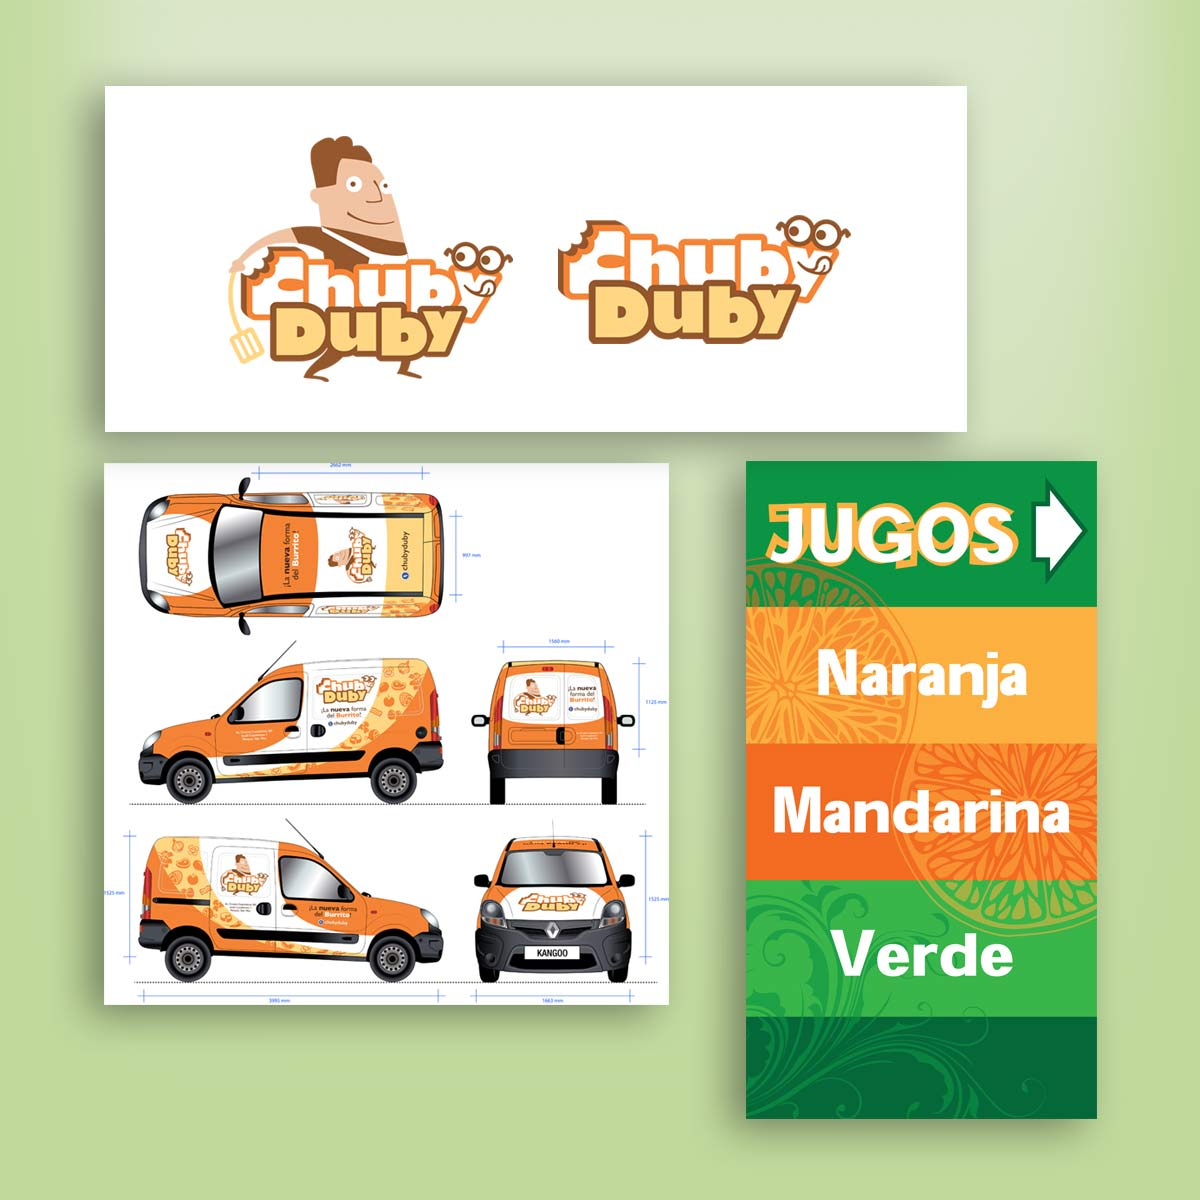 diseño de logotipo personaje Chubyduby